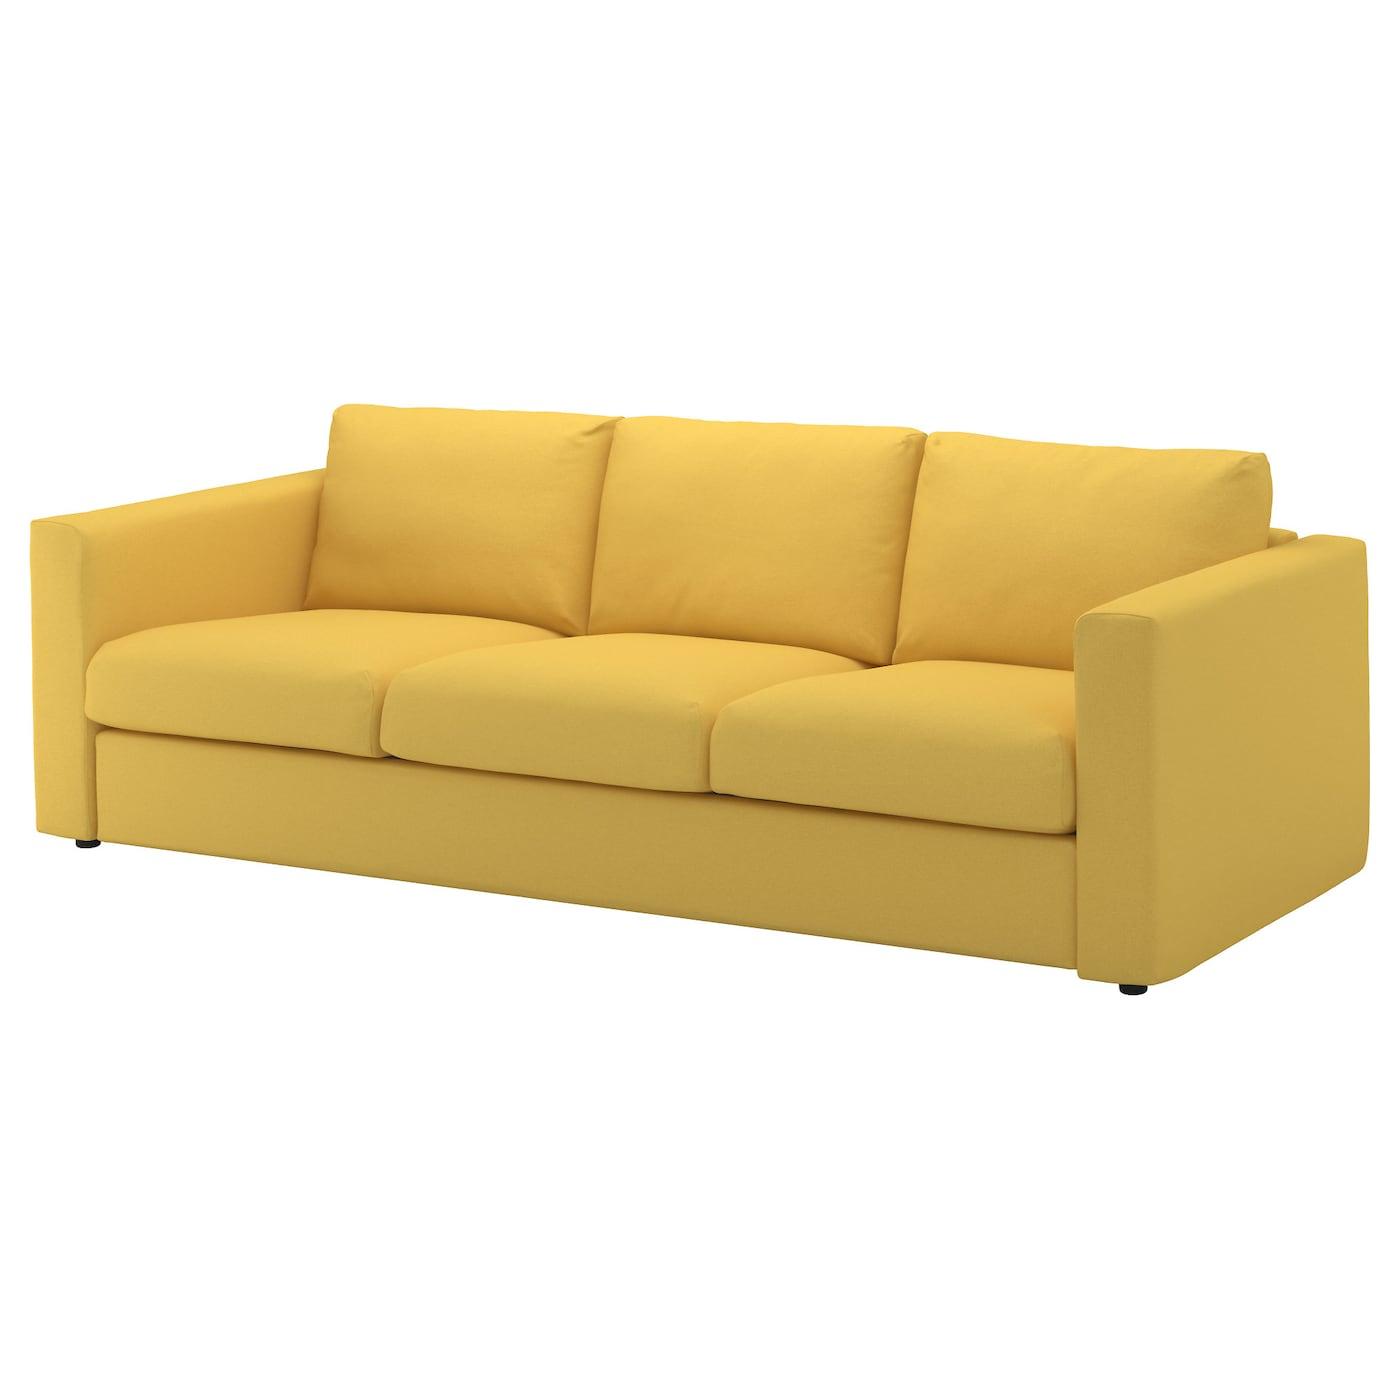 VIMLE Canapé 3 places Orrsta jaune doré IKEA